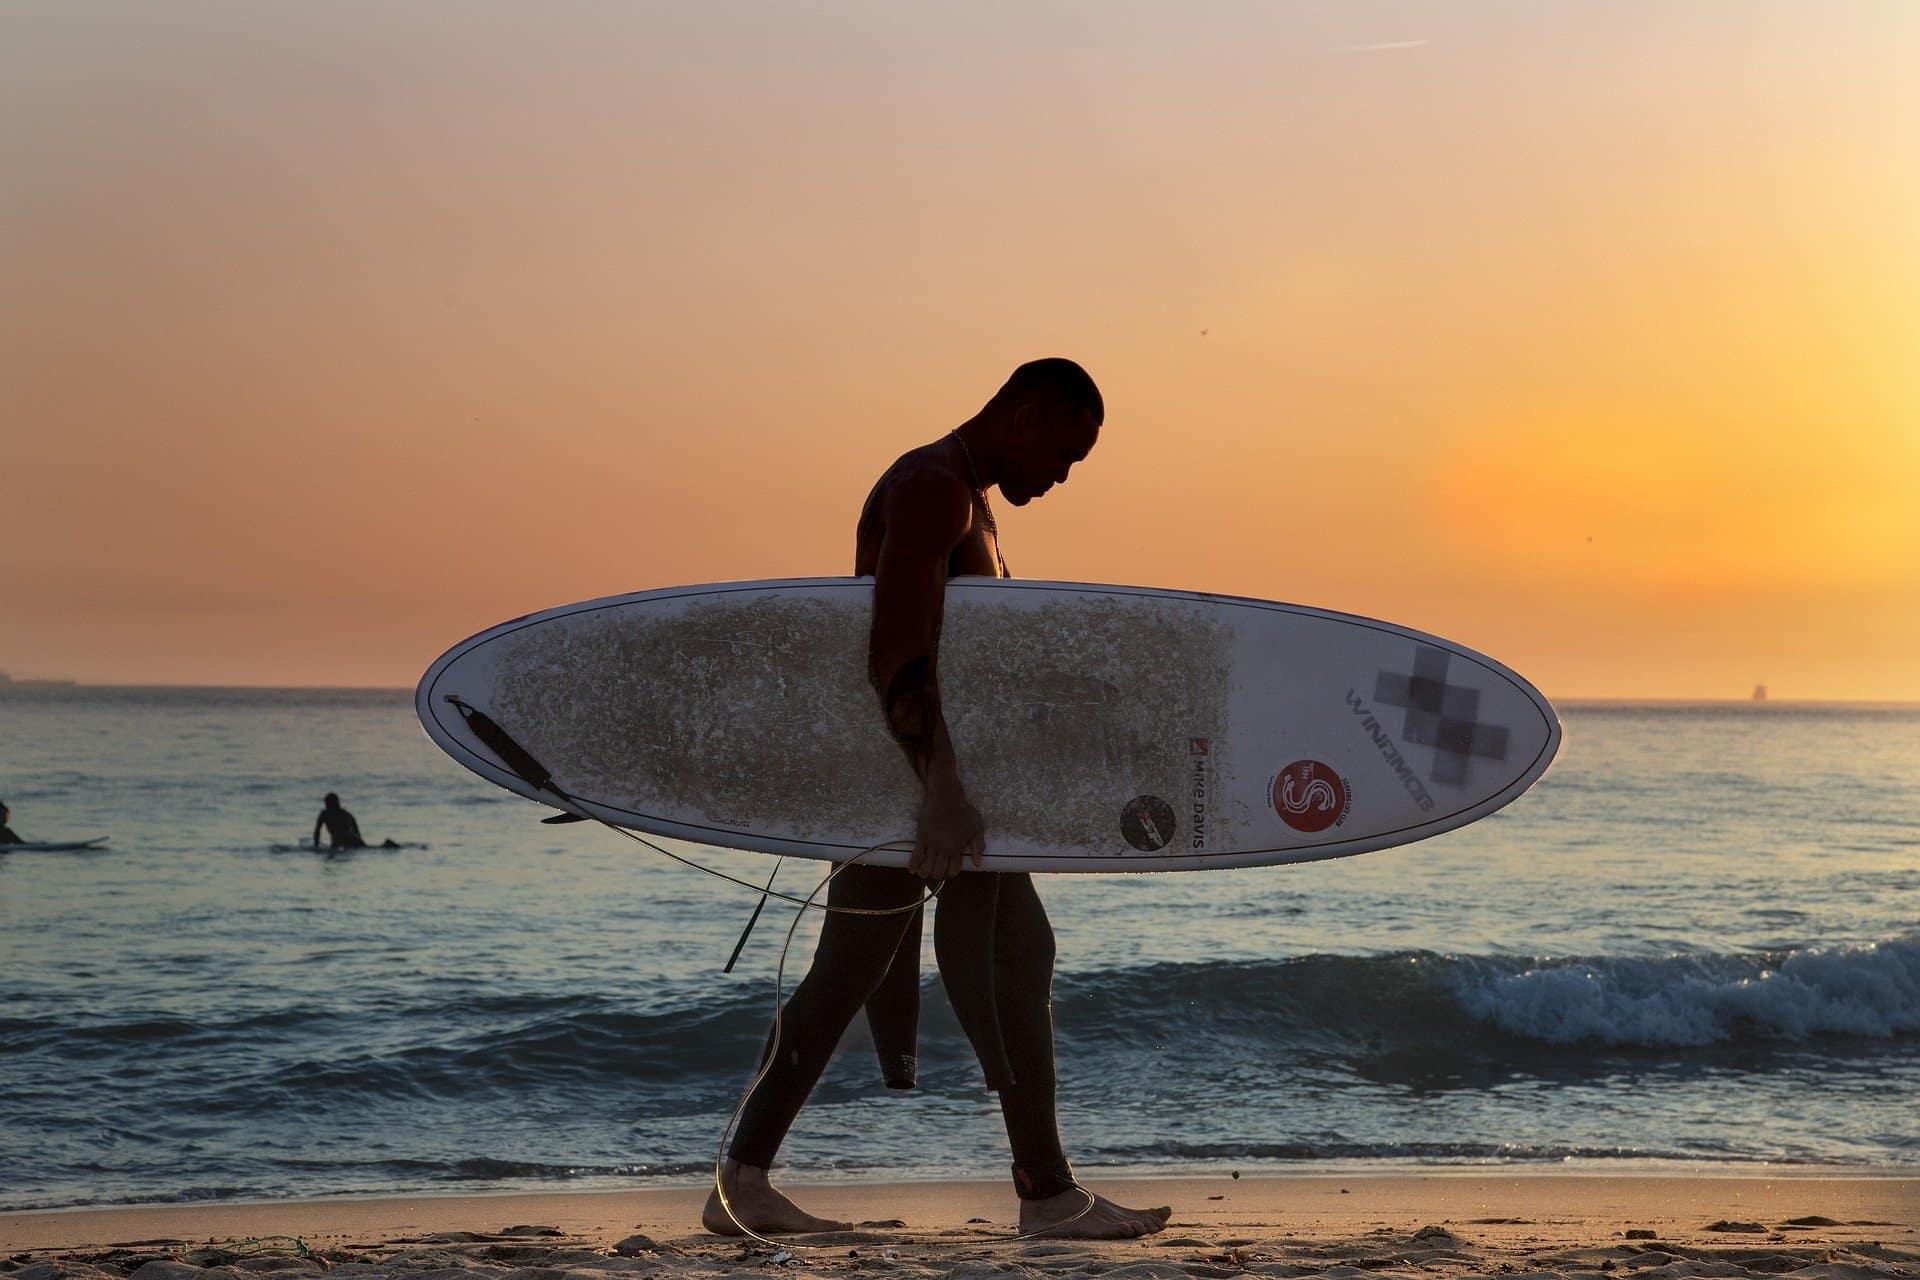 reserve-mondiale-de-surf-cover-costa-rica-decouverte